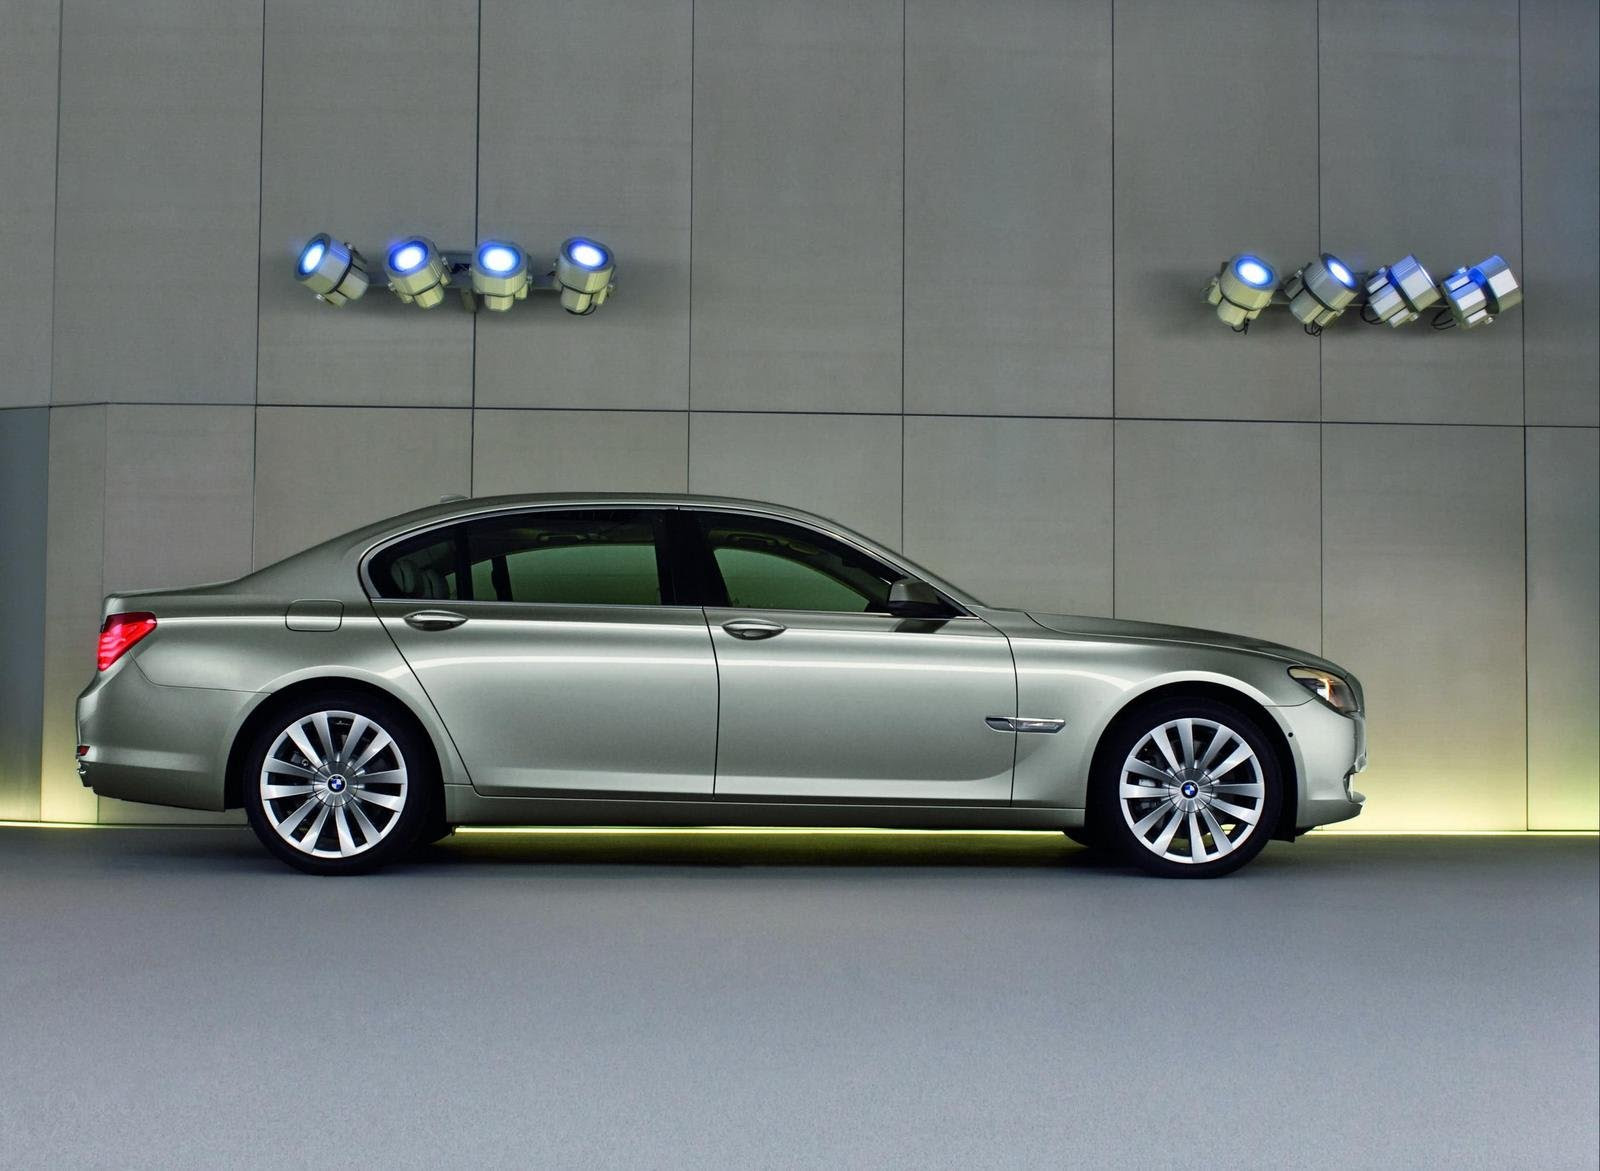 2009 BMW 7-Series wallpaper image free wallpaper download: